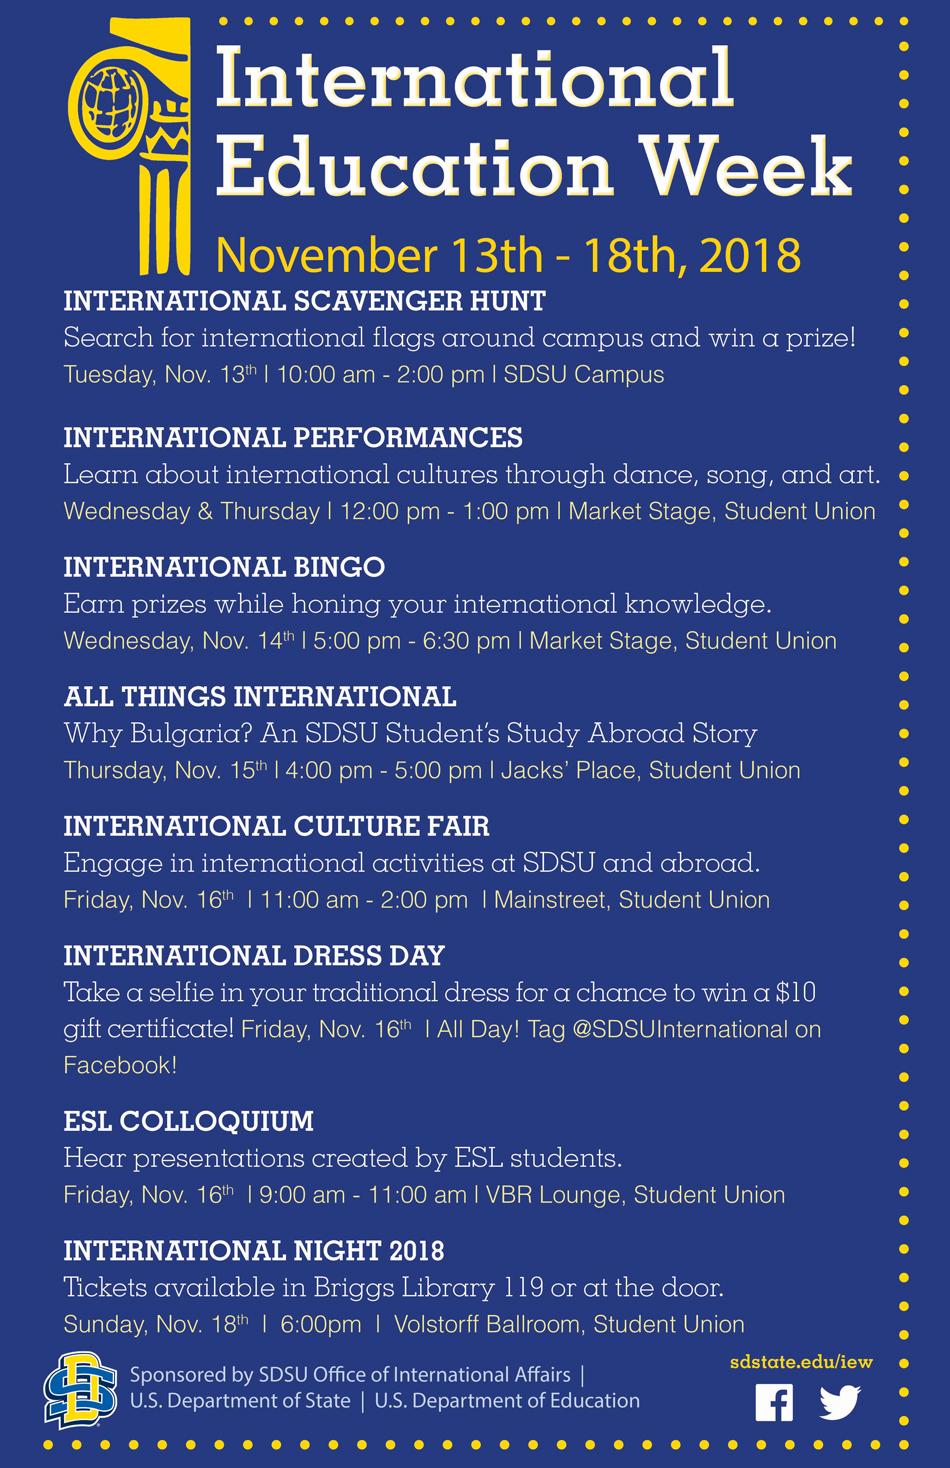 International Education Week South Dakota State University